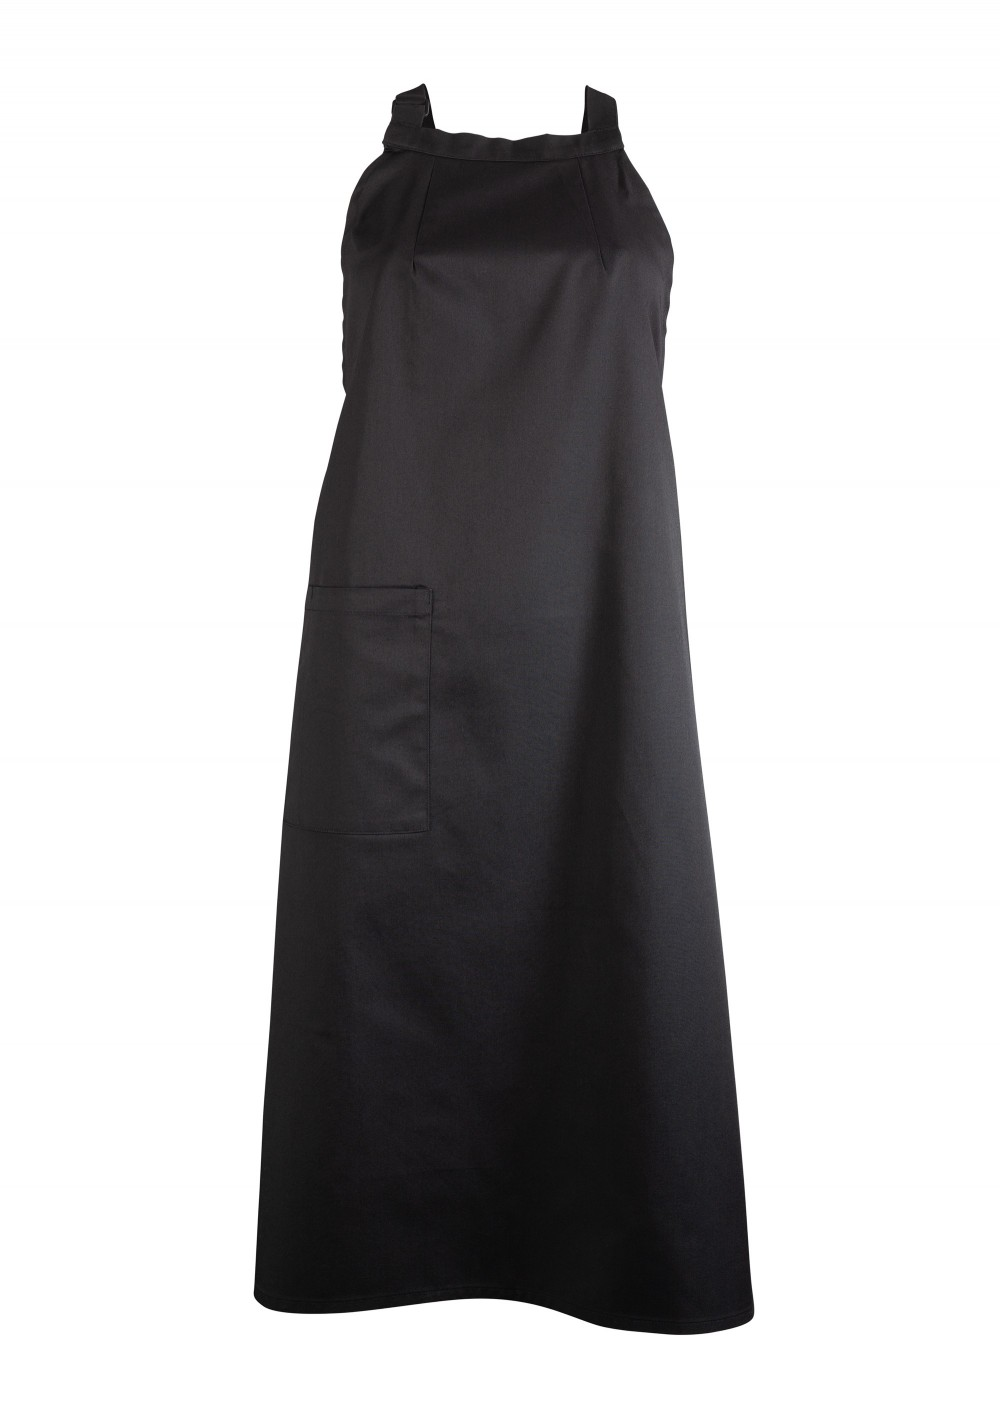 Unisex Bib Apron on Jet Black with Pocket